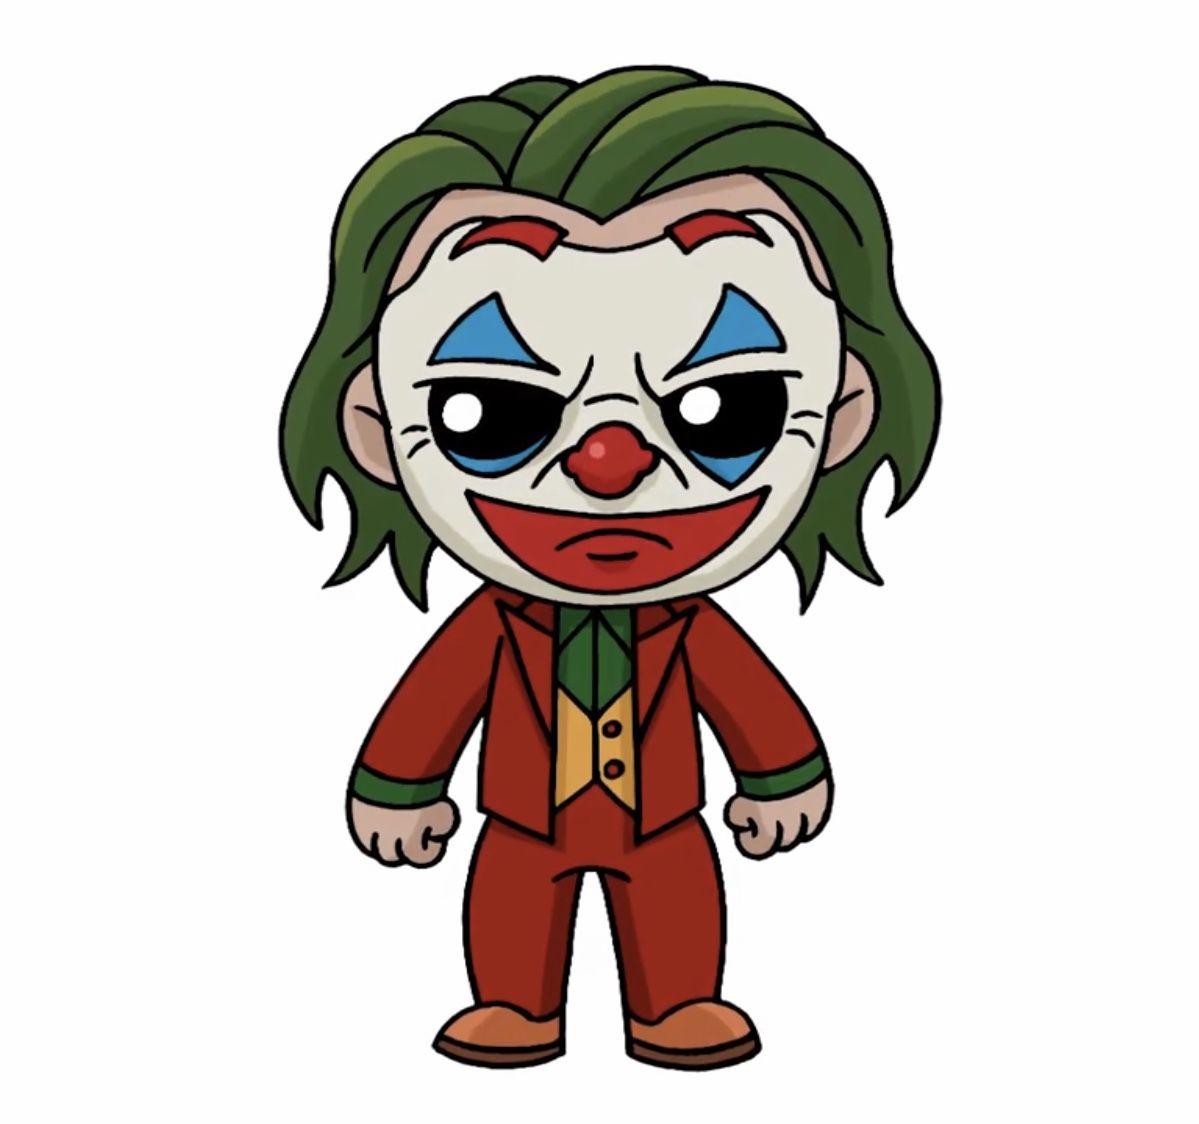 Baby New Joker Svg Layered The Joker Movie Poster Print Etsy Joker Cartoon Cartoon Drawings Joker Drawings